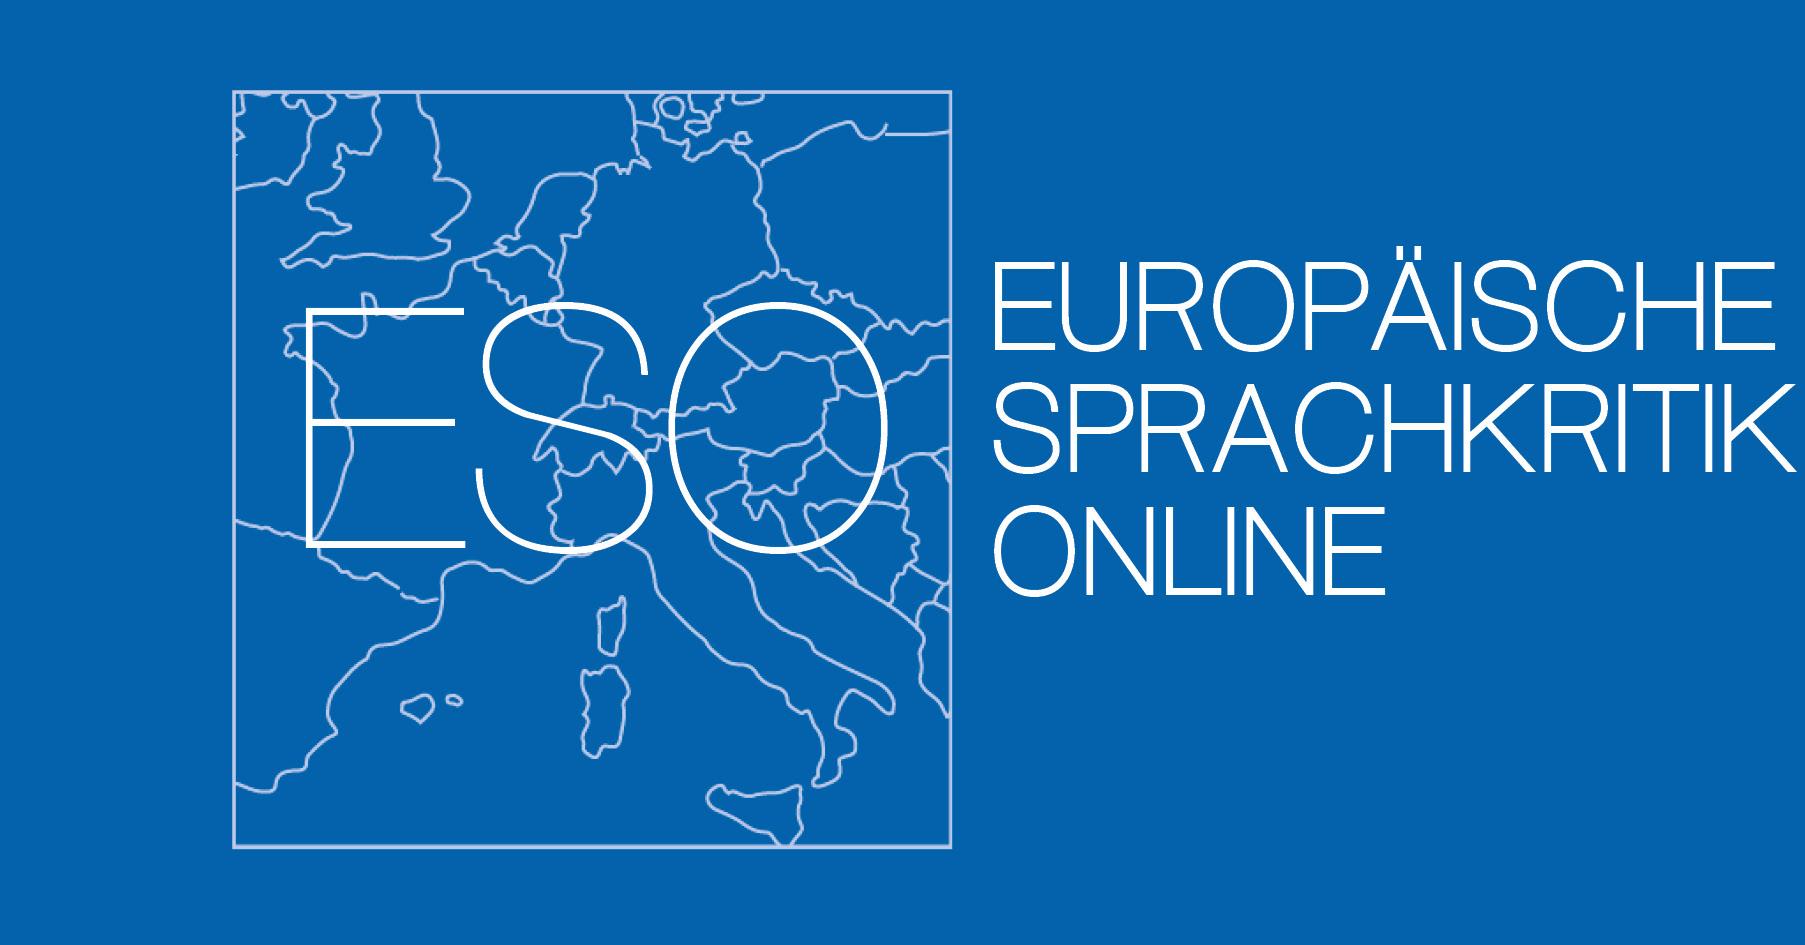 europsprachkritik.com